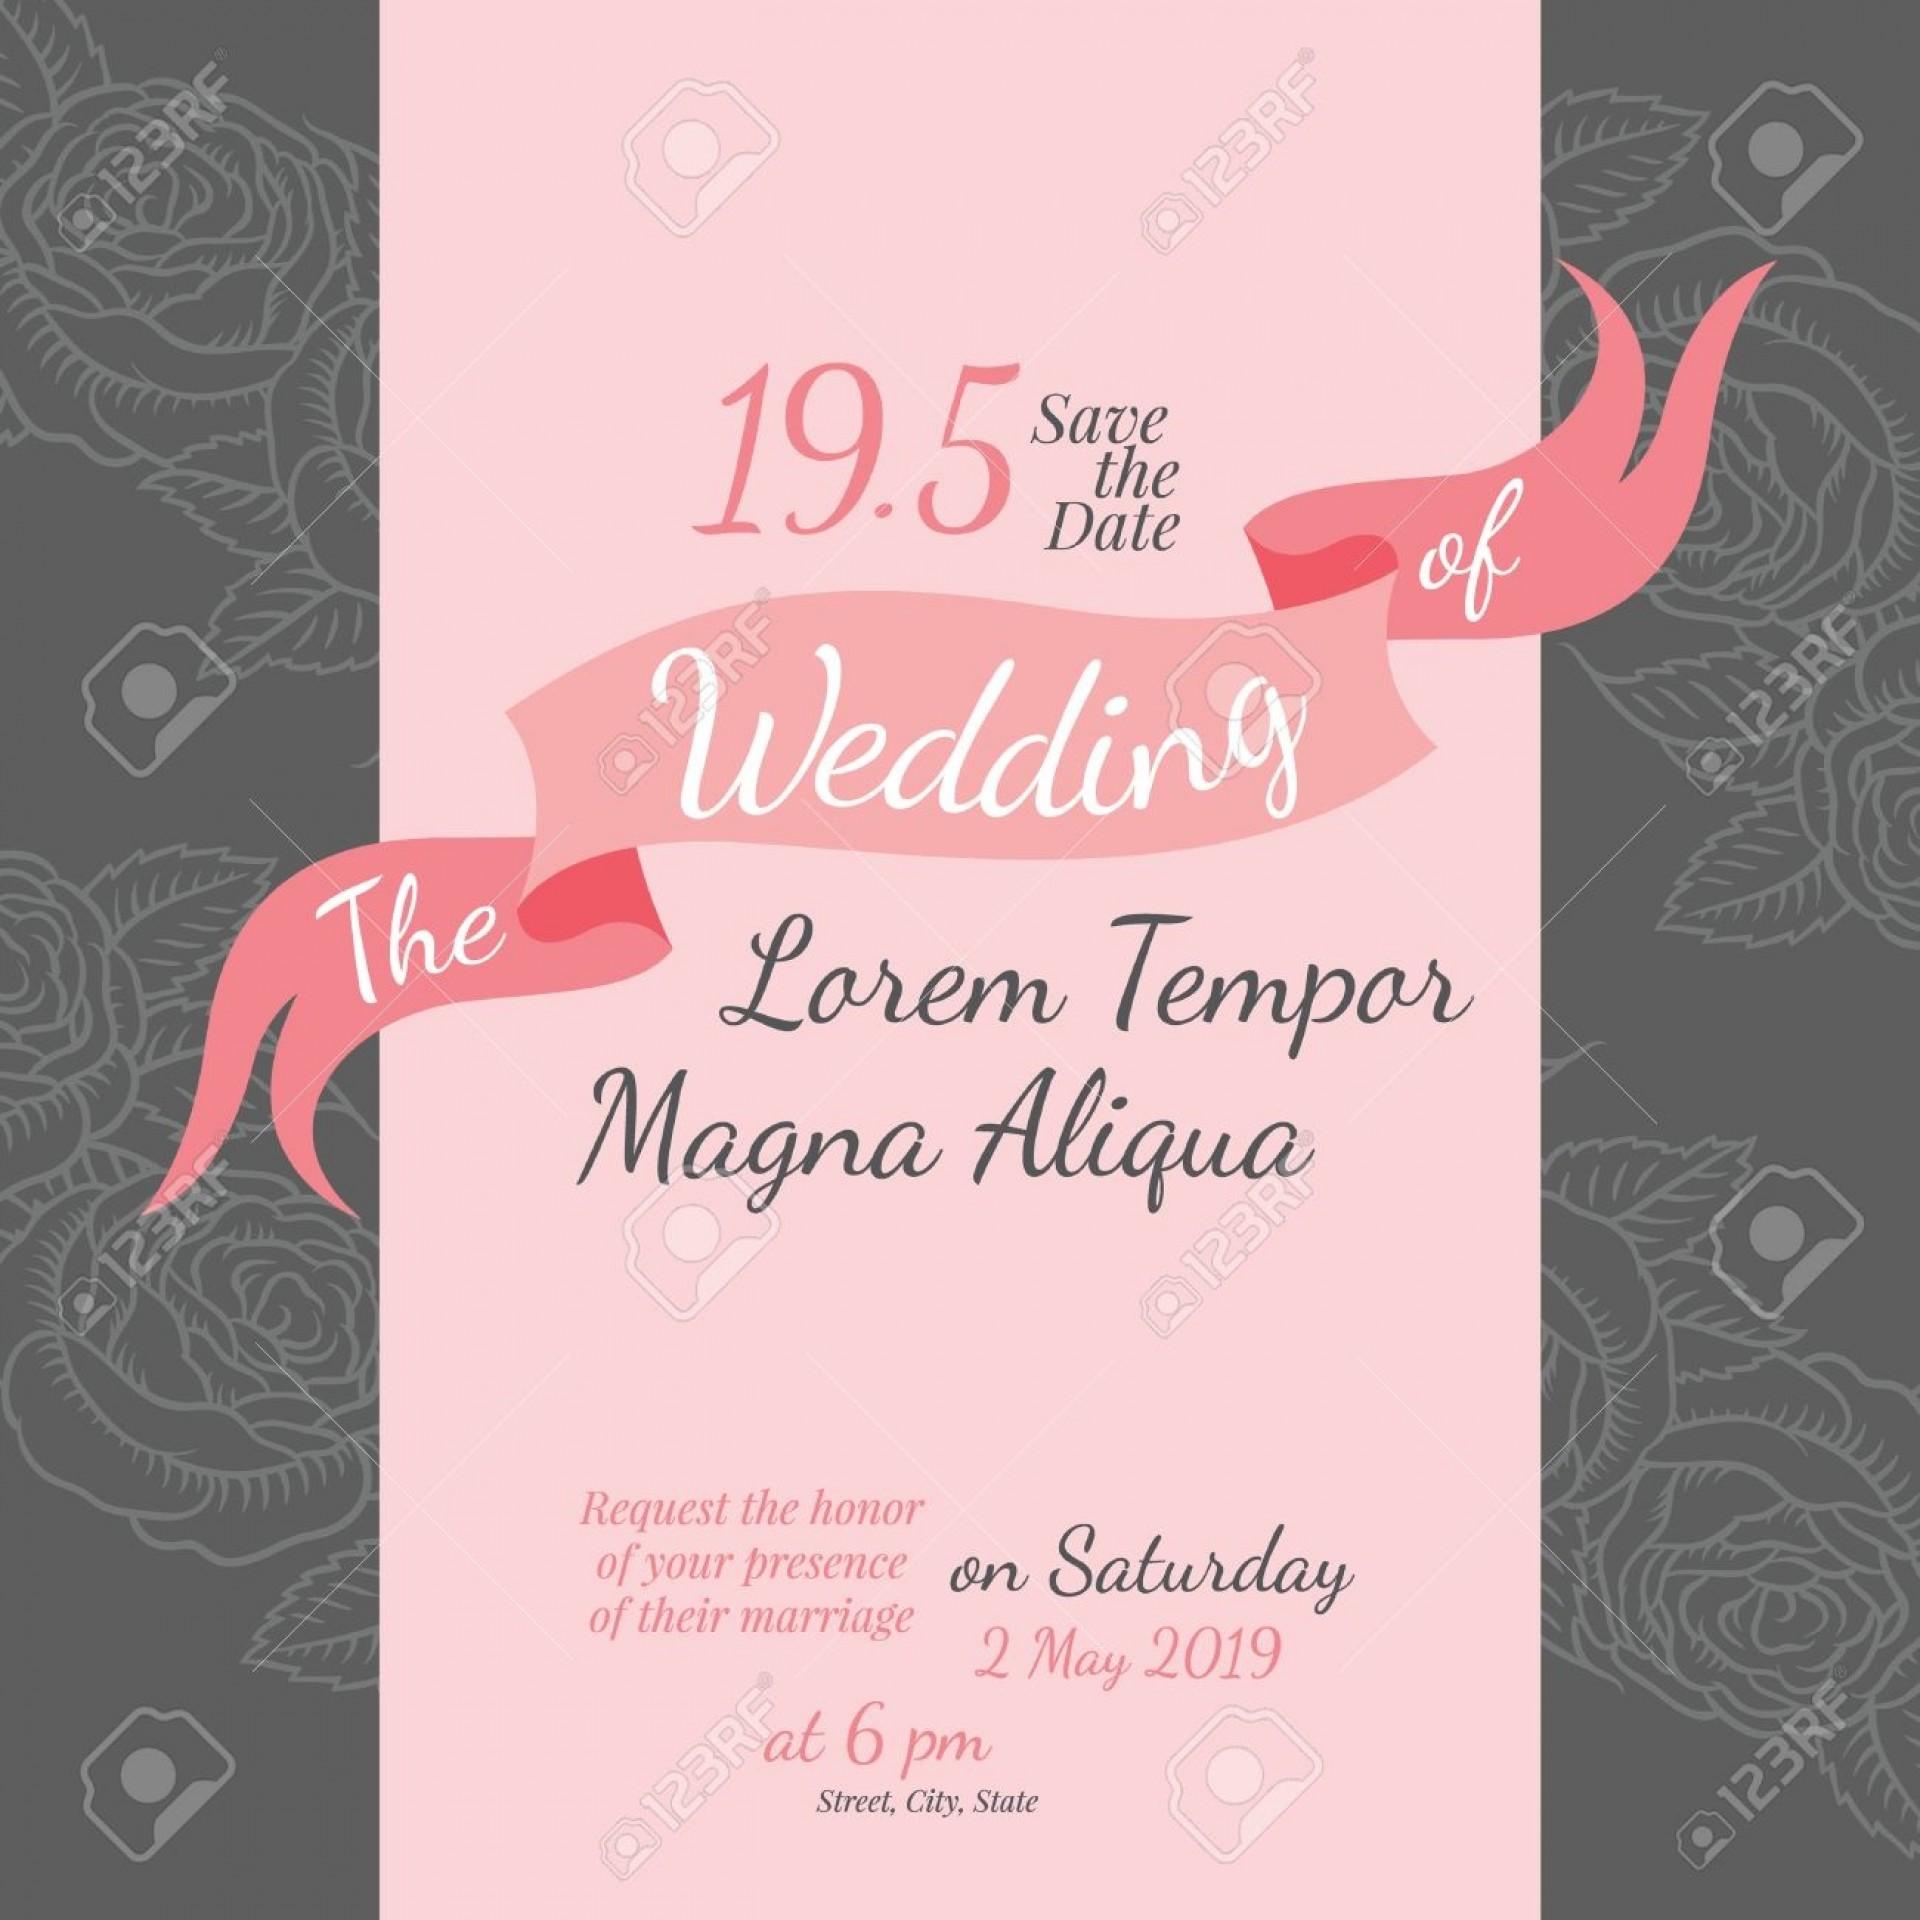 001 Unbelievable Bridal Shower Card Template Highest Clarity  Invitation Free Download Bingo1920